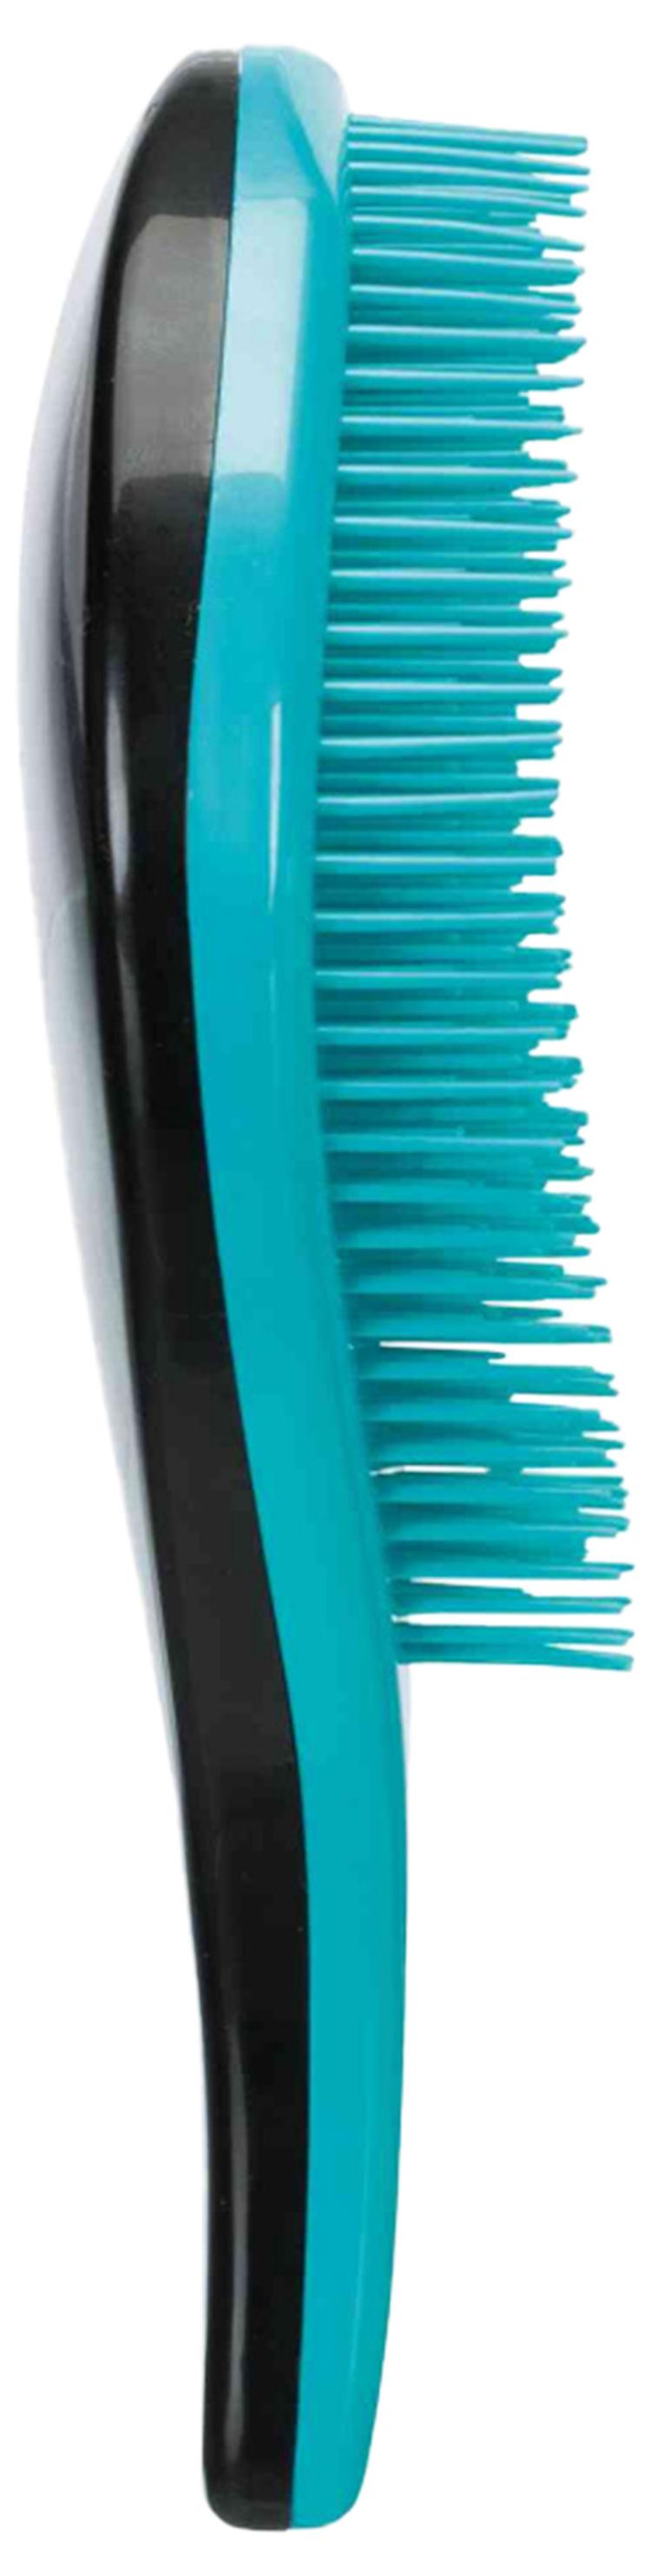 Ķemme dzīvniekiem – TRIXIE Soft Brush, plastic, 19 cm